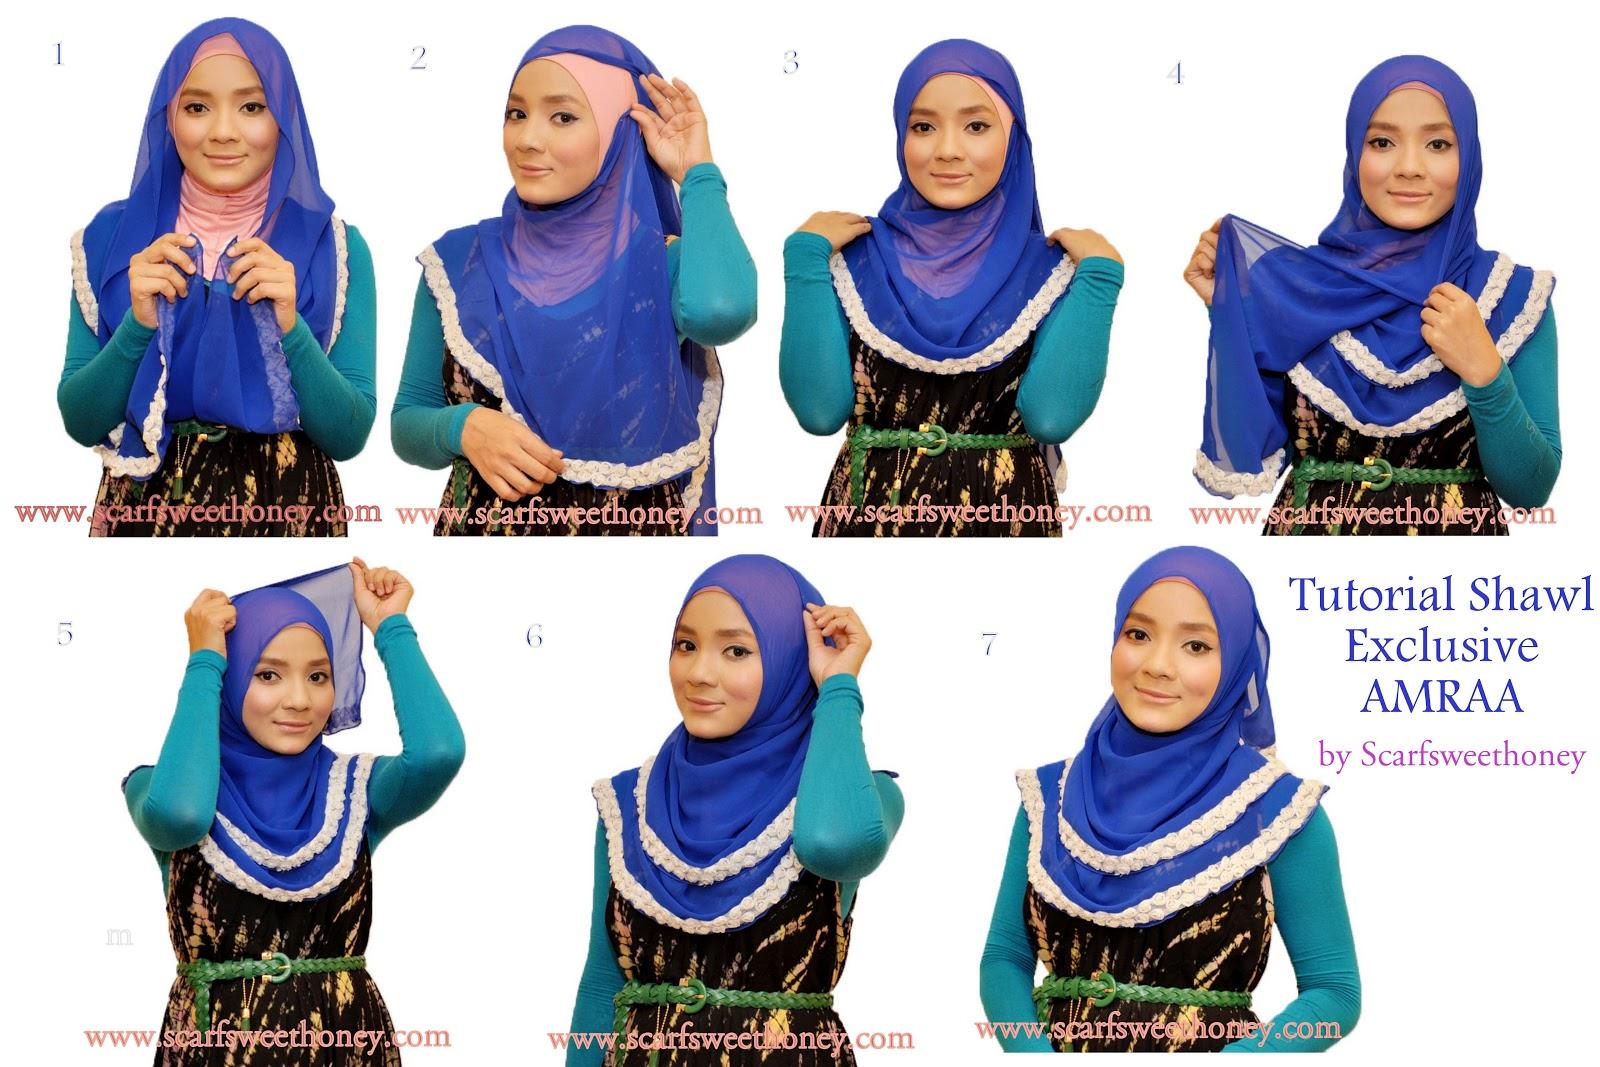 Gambar Tutorial Cara Memakai Jilbab Lengkap 90 Gaya Bagian Ke 2